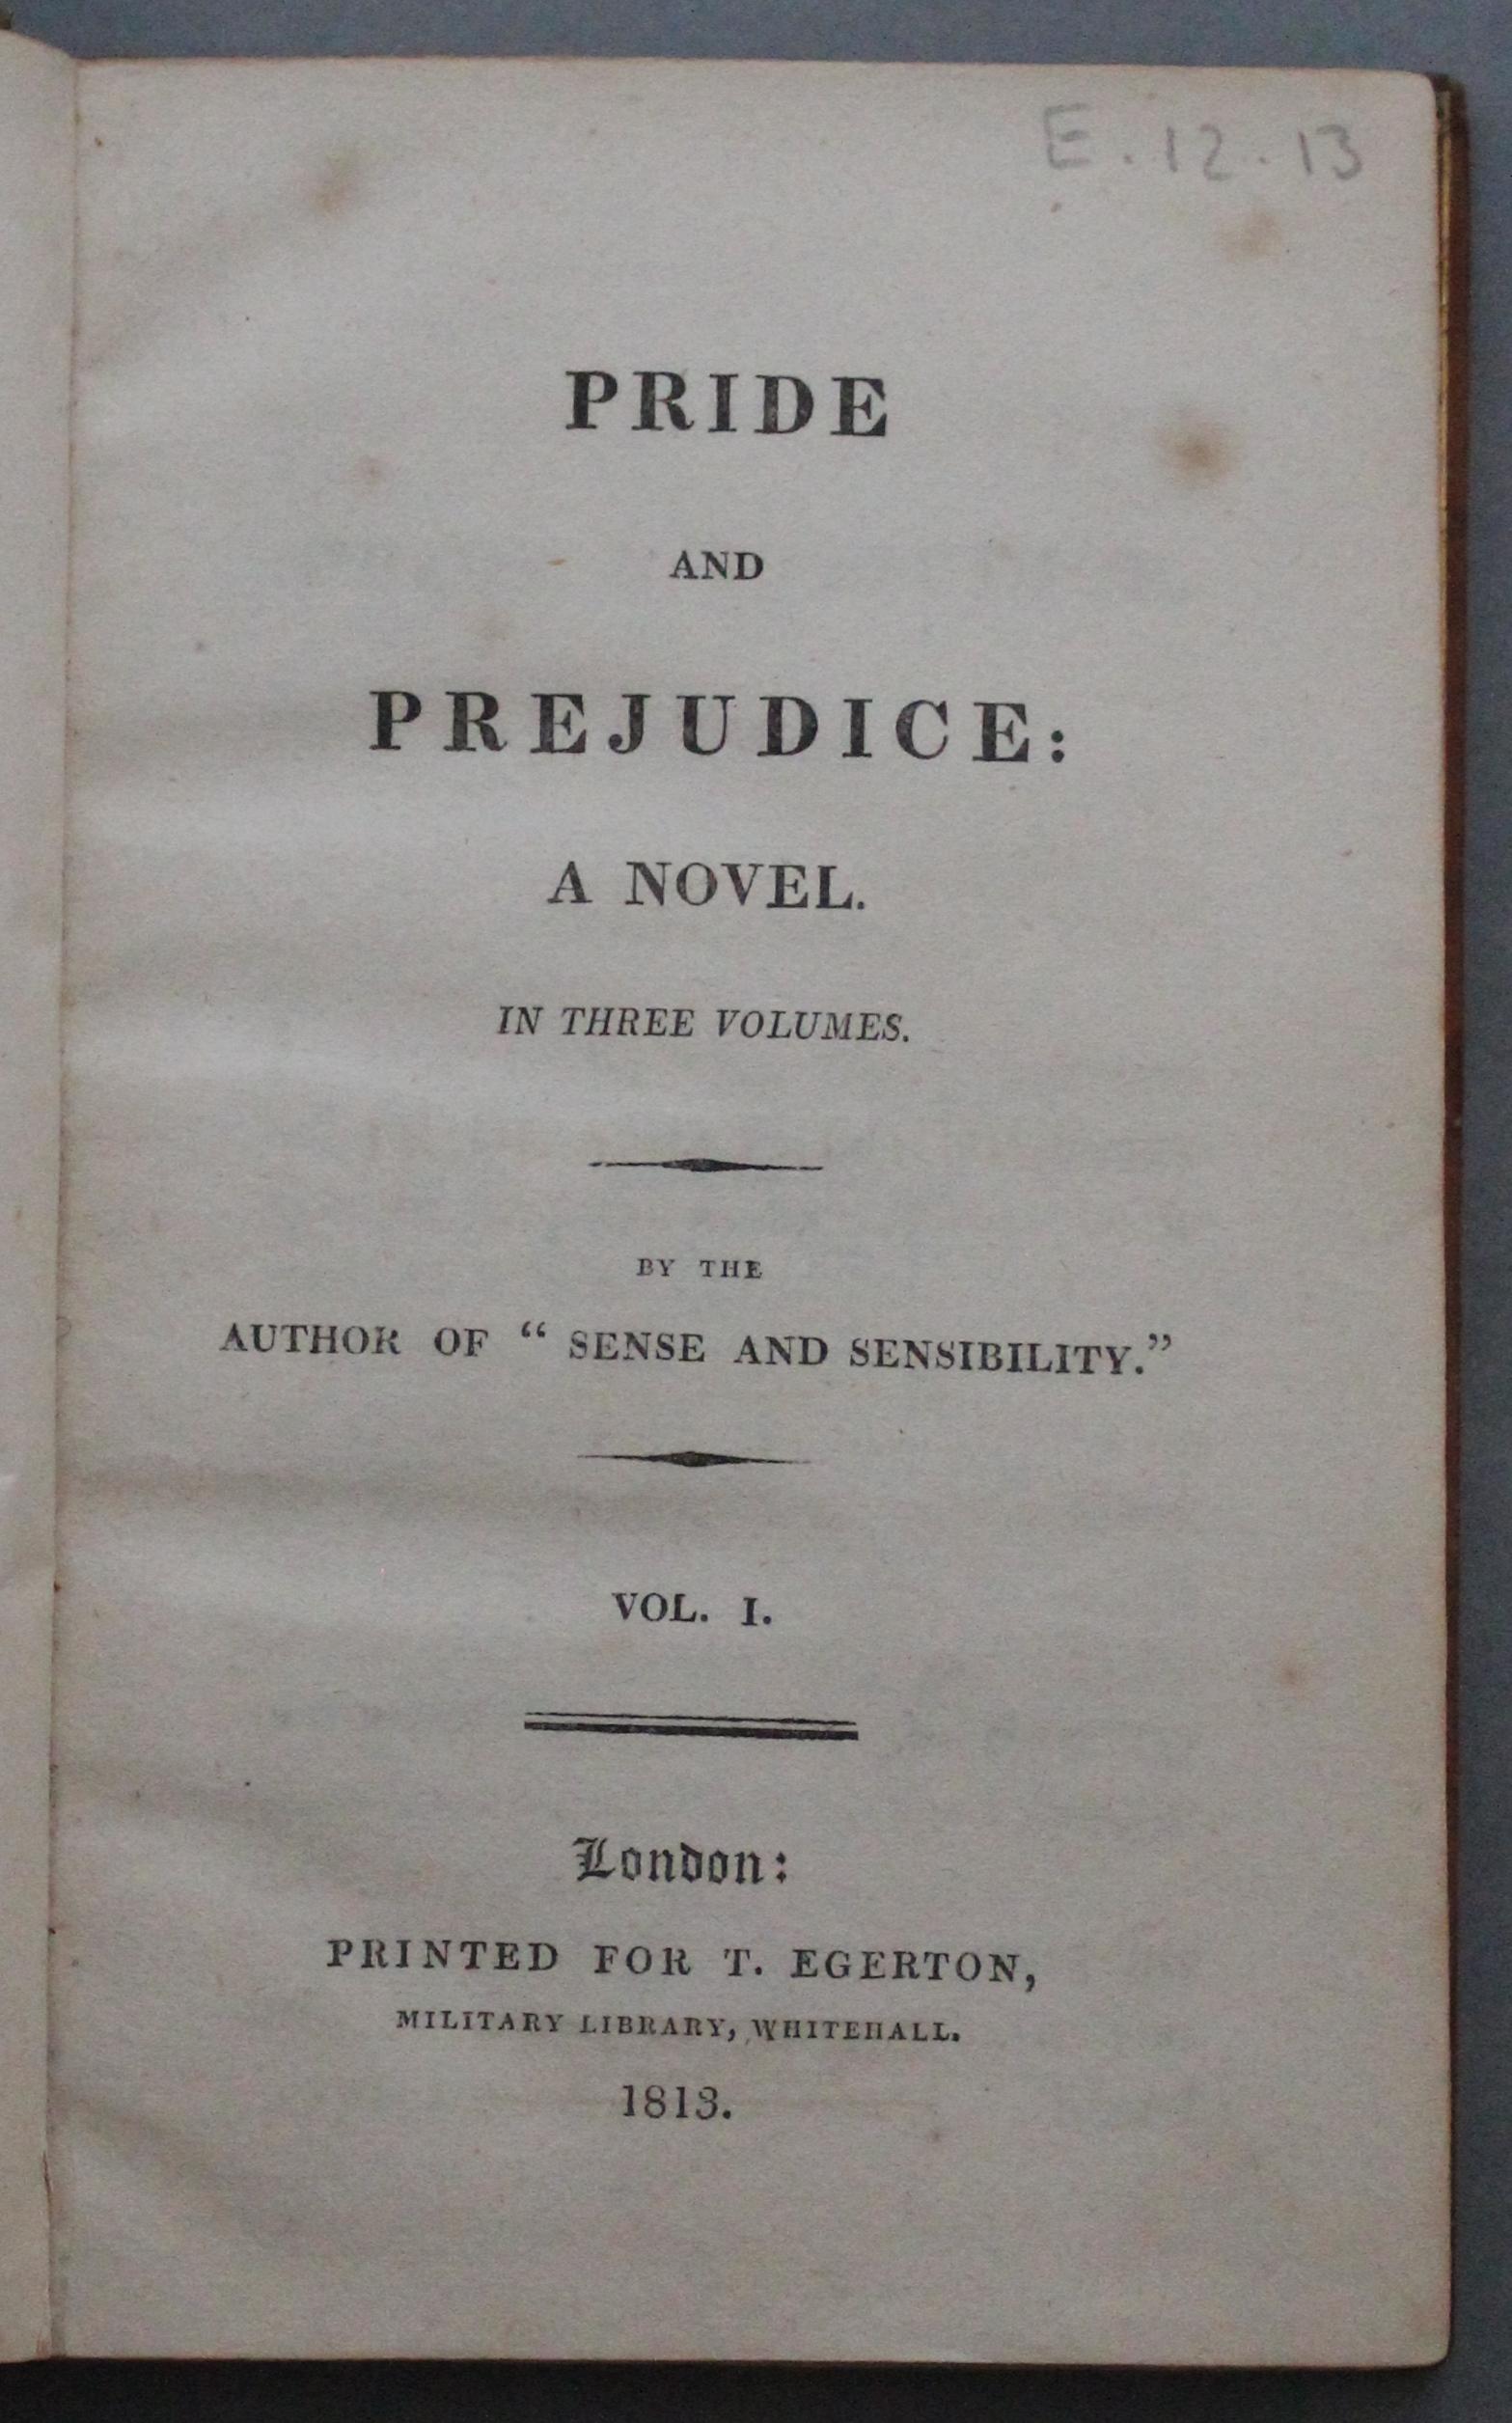 Warren.A.Pr.1813 title page